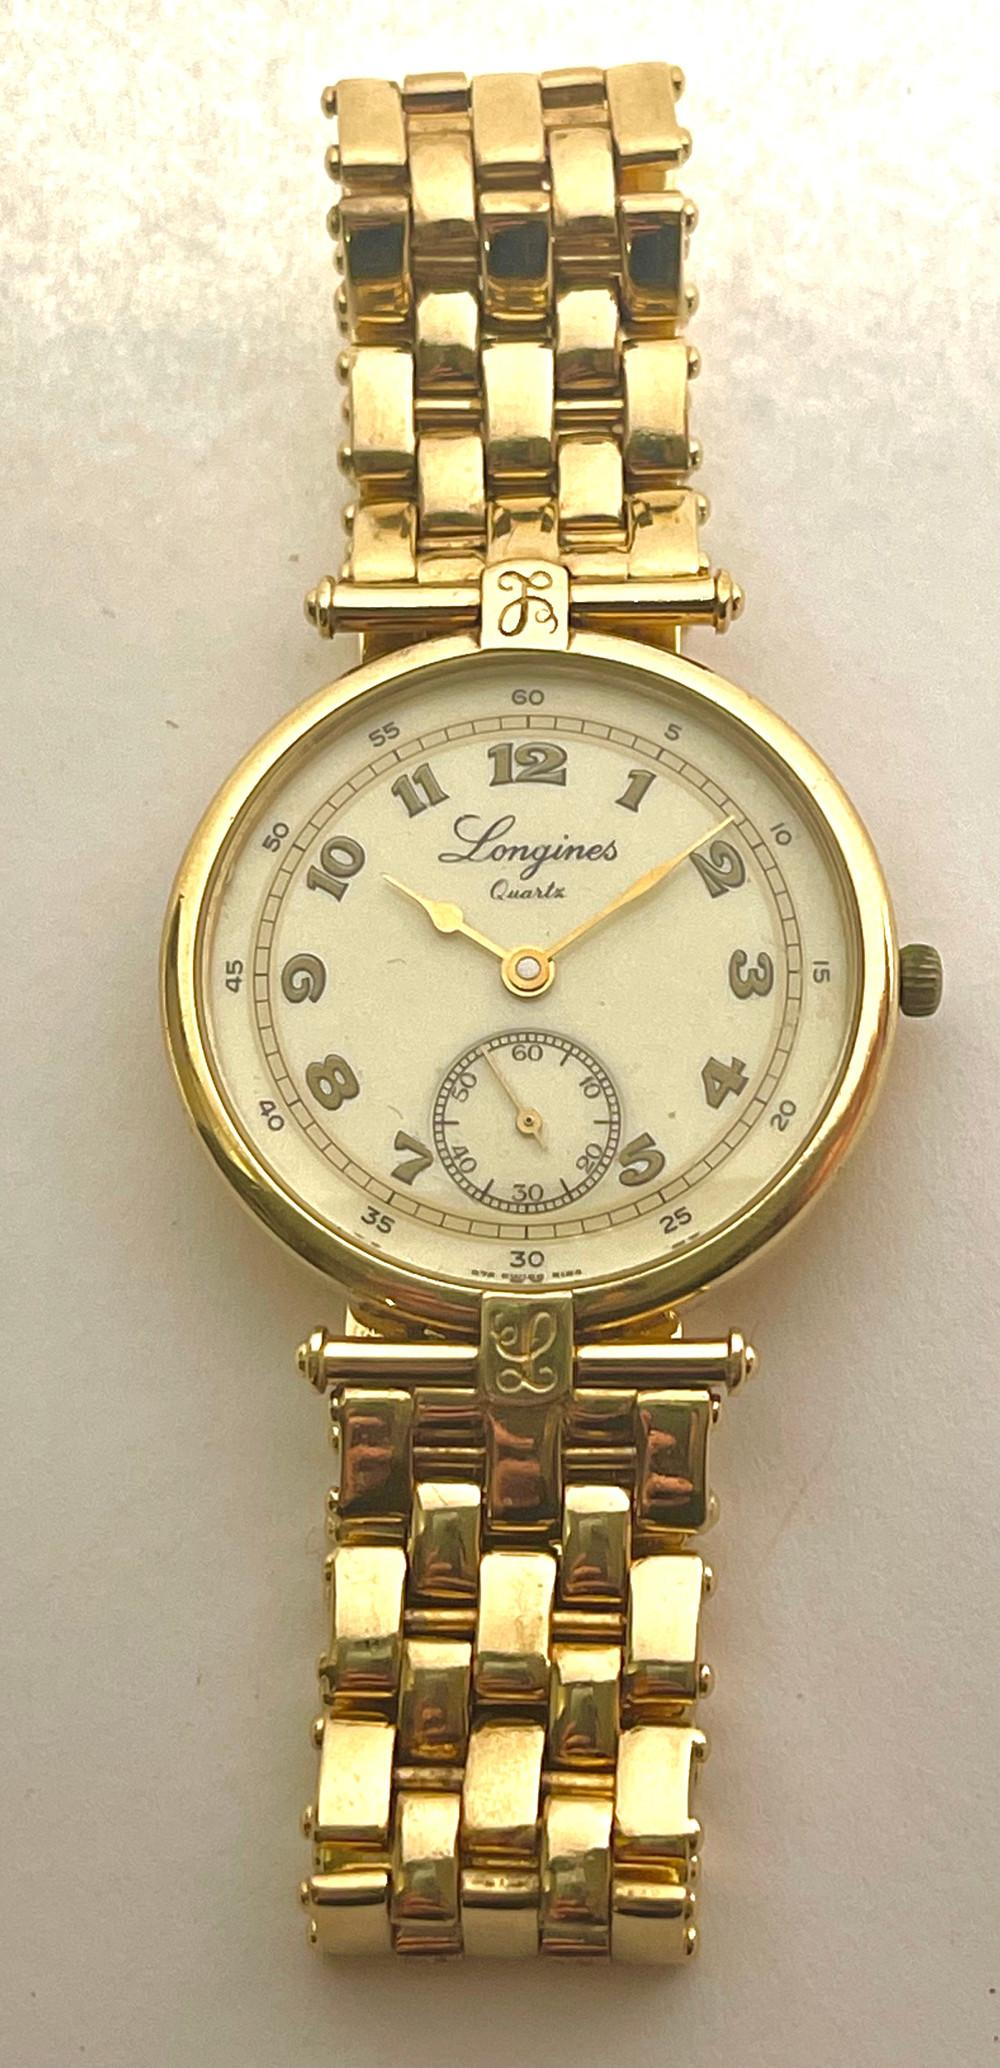 Longines Classics wristwatch circa 1980.